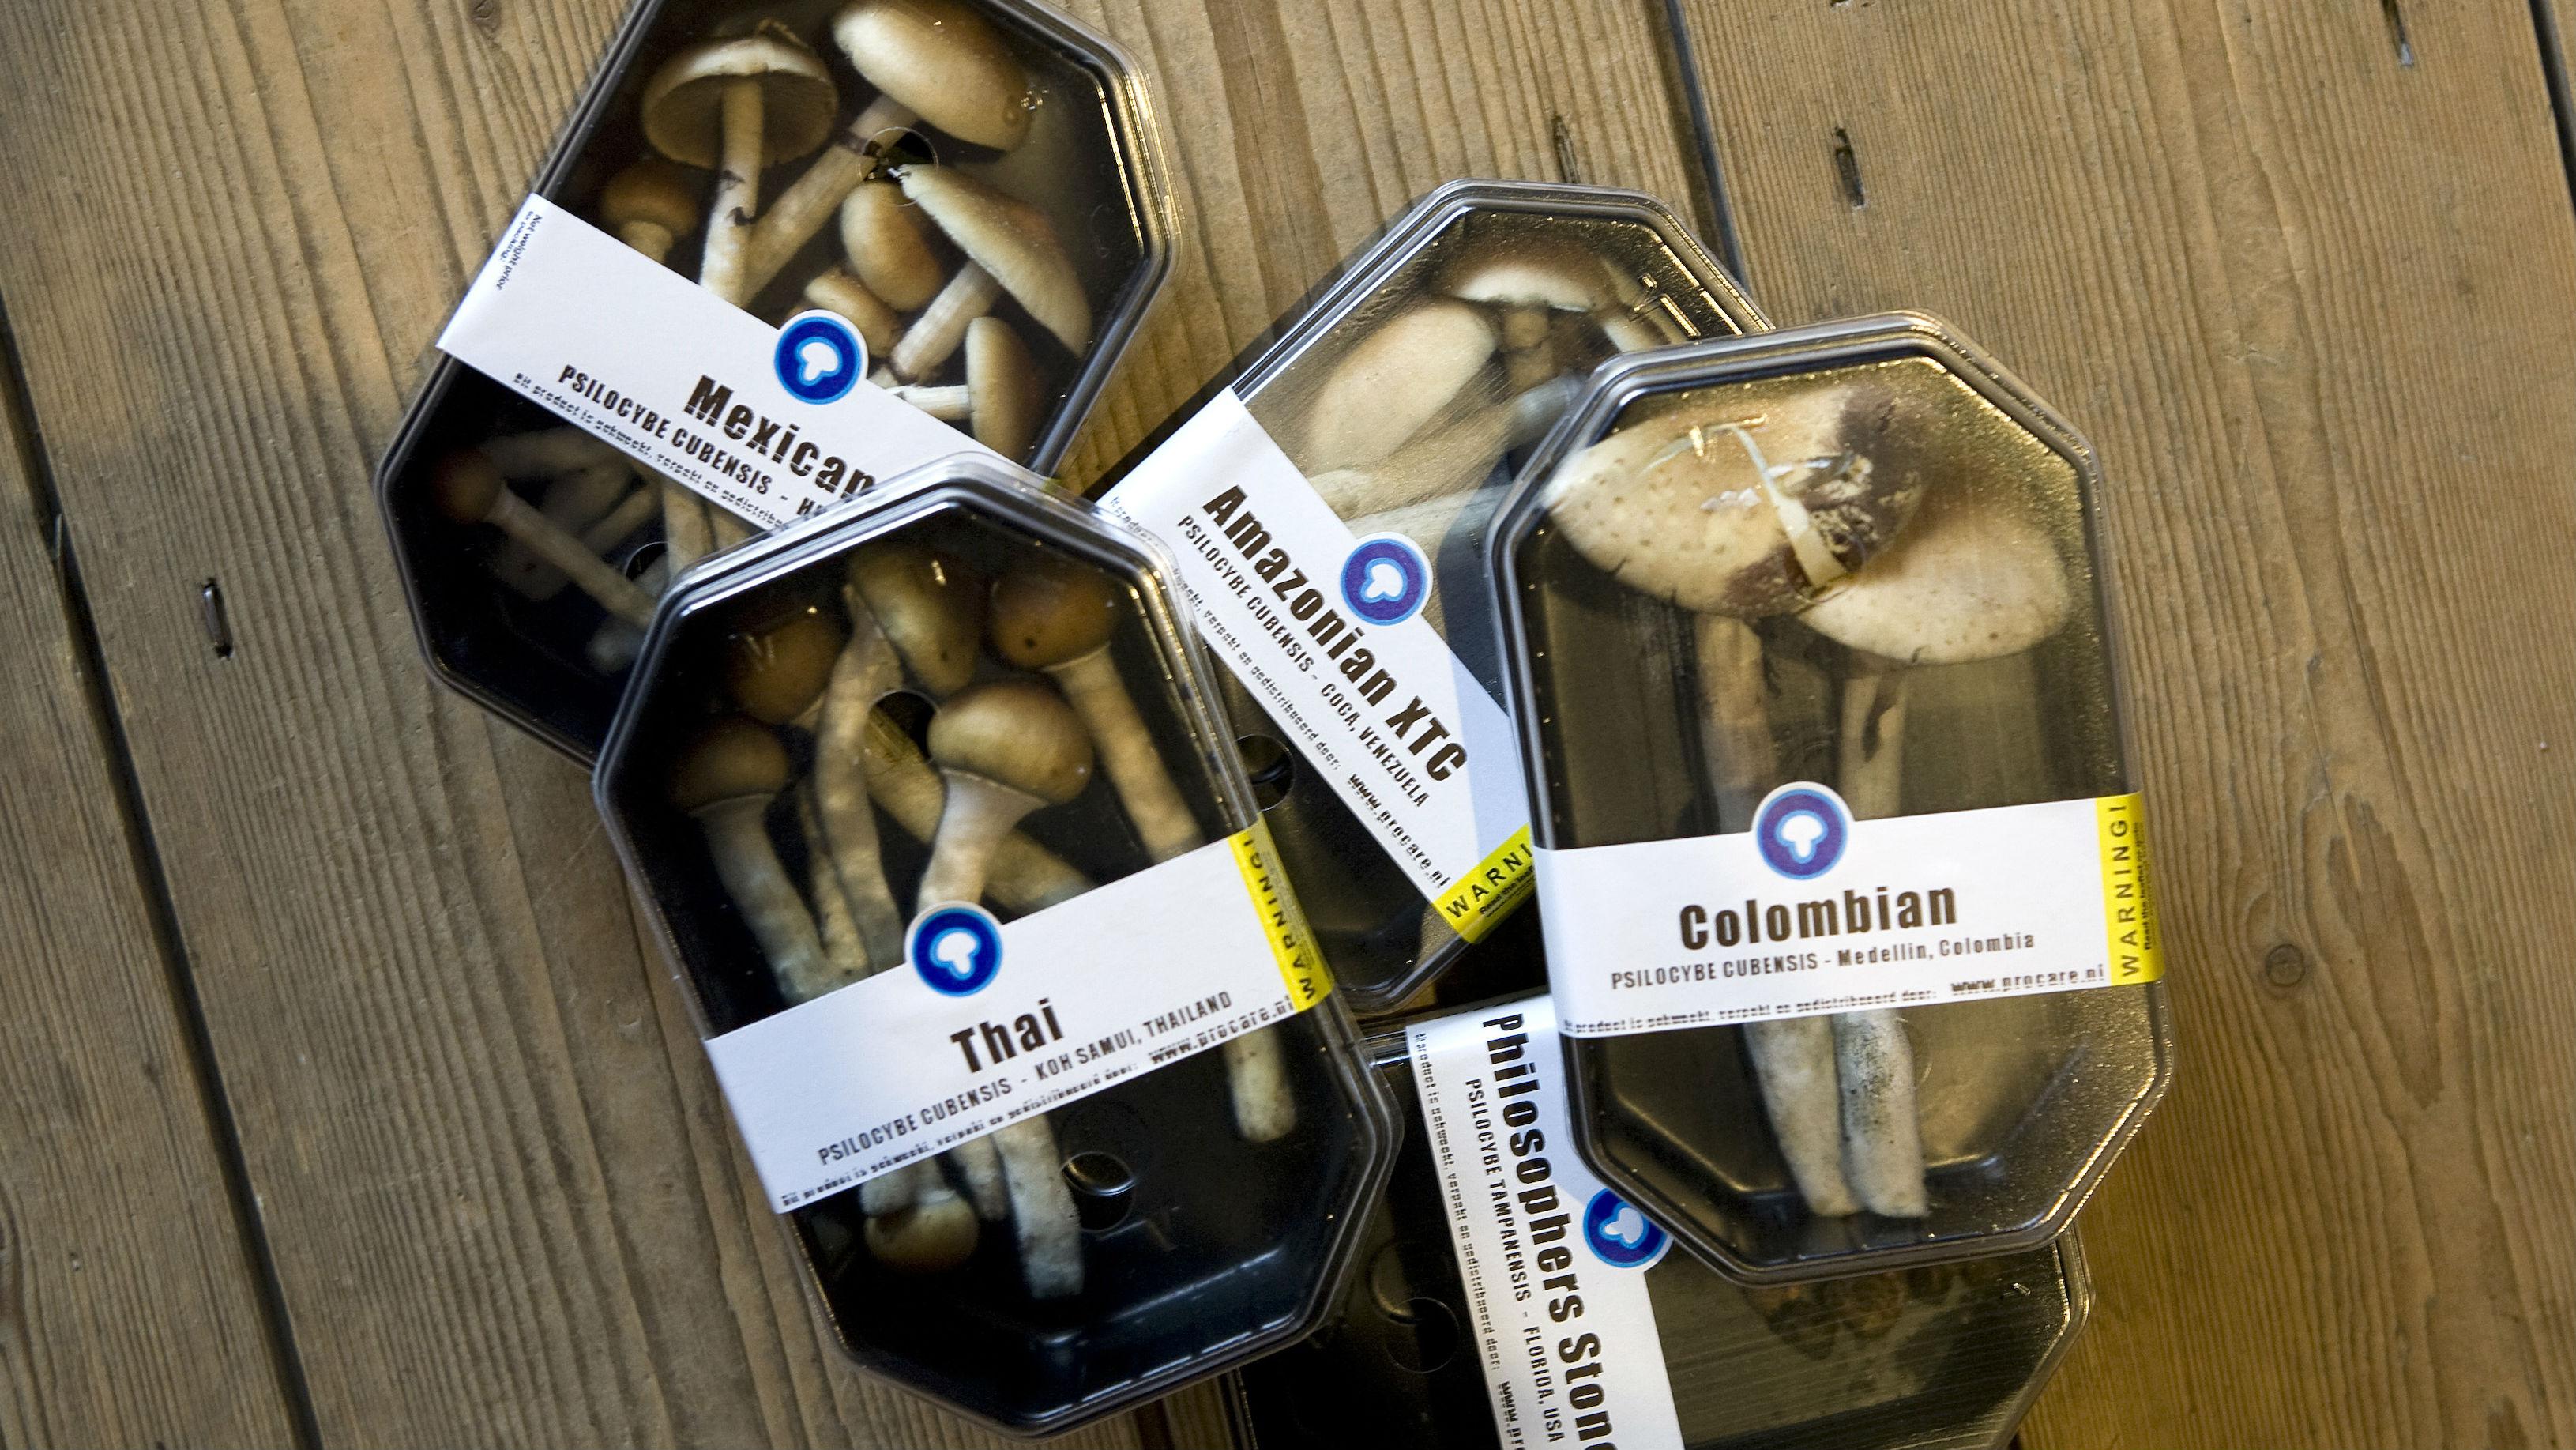 Cartons Of Magic Mushrooms To Be Sold